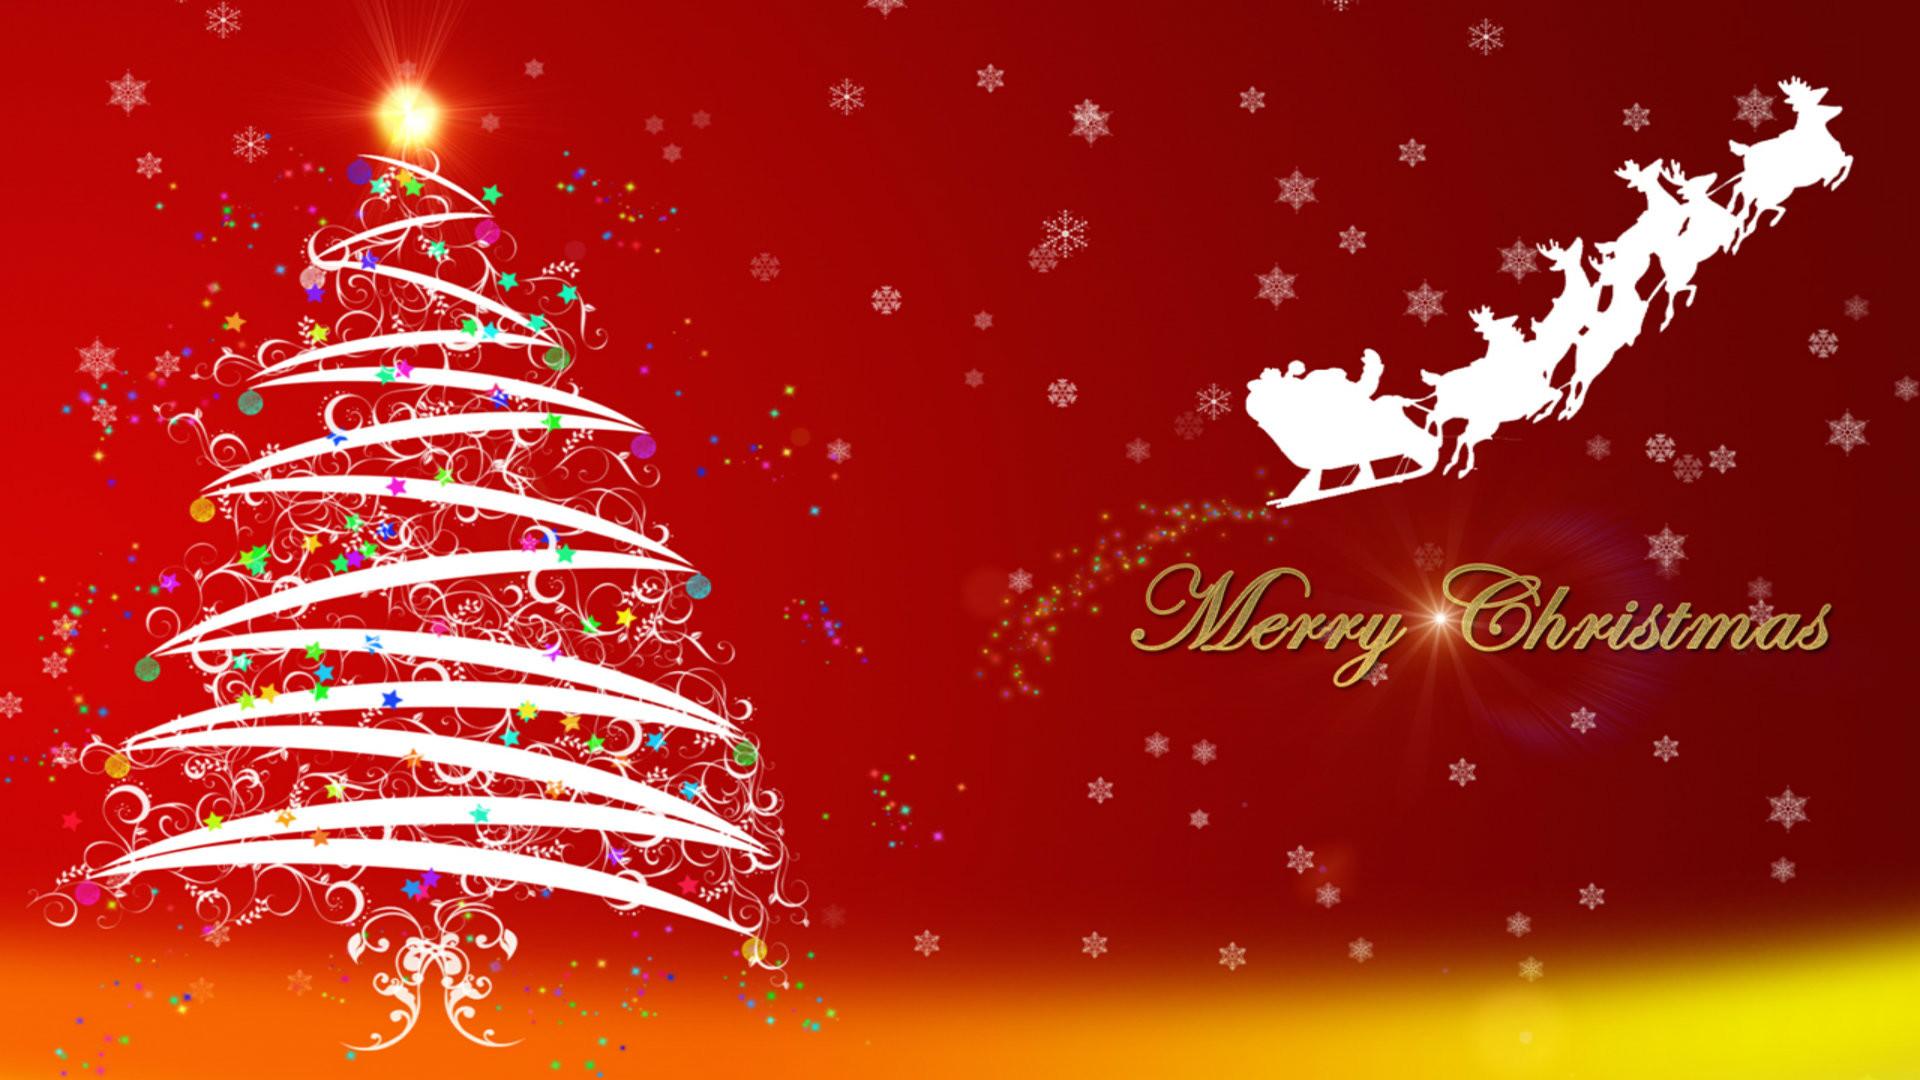 Merry Christmas Full HD Wallpaper 1920×1080